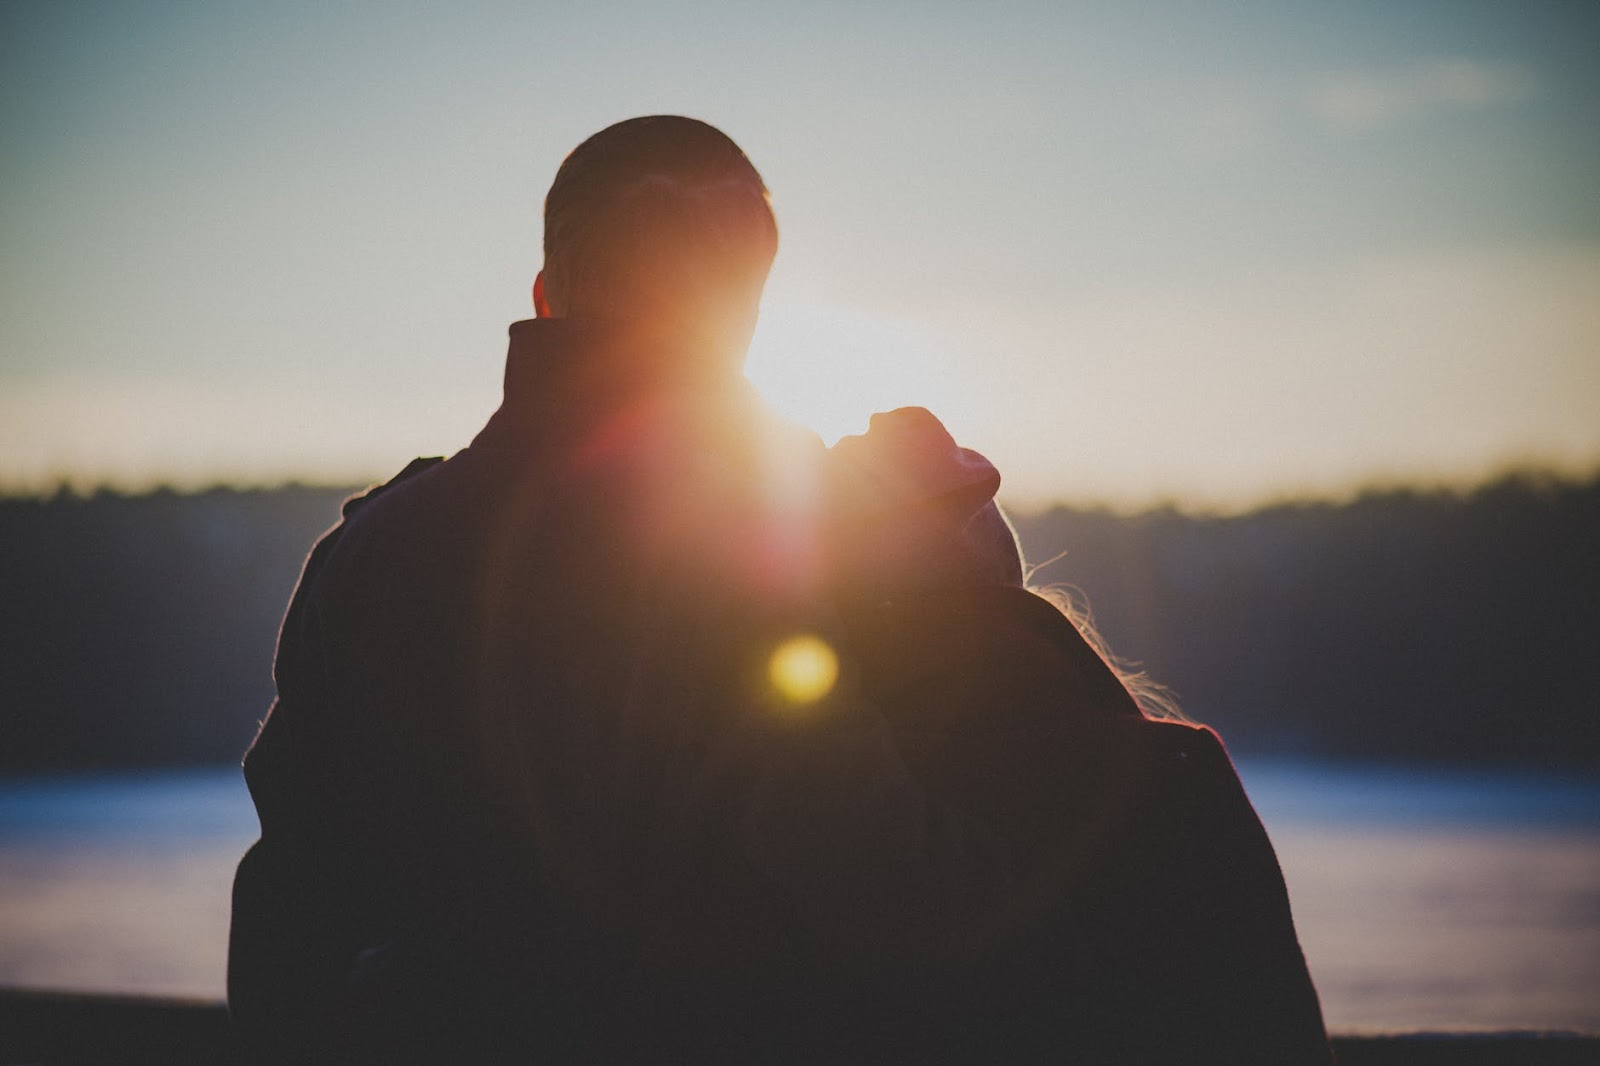 Puisi Ungkapan Perasaan Untuk Calon Kekasih Paling Ngena